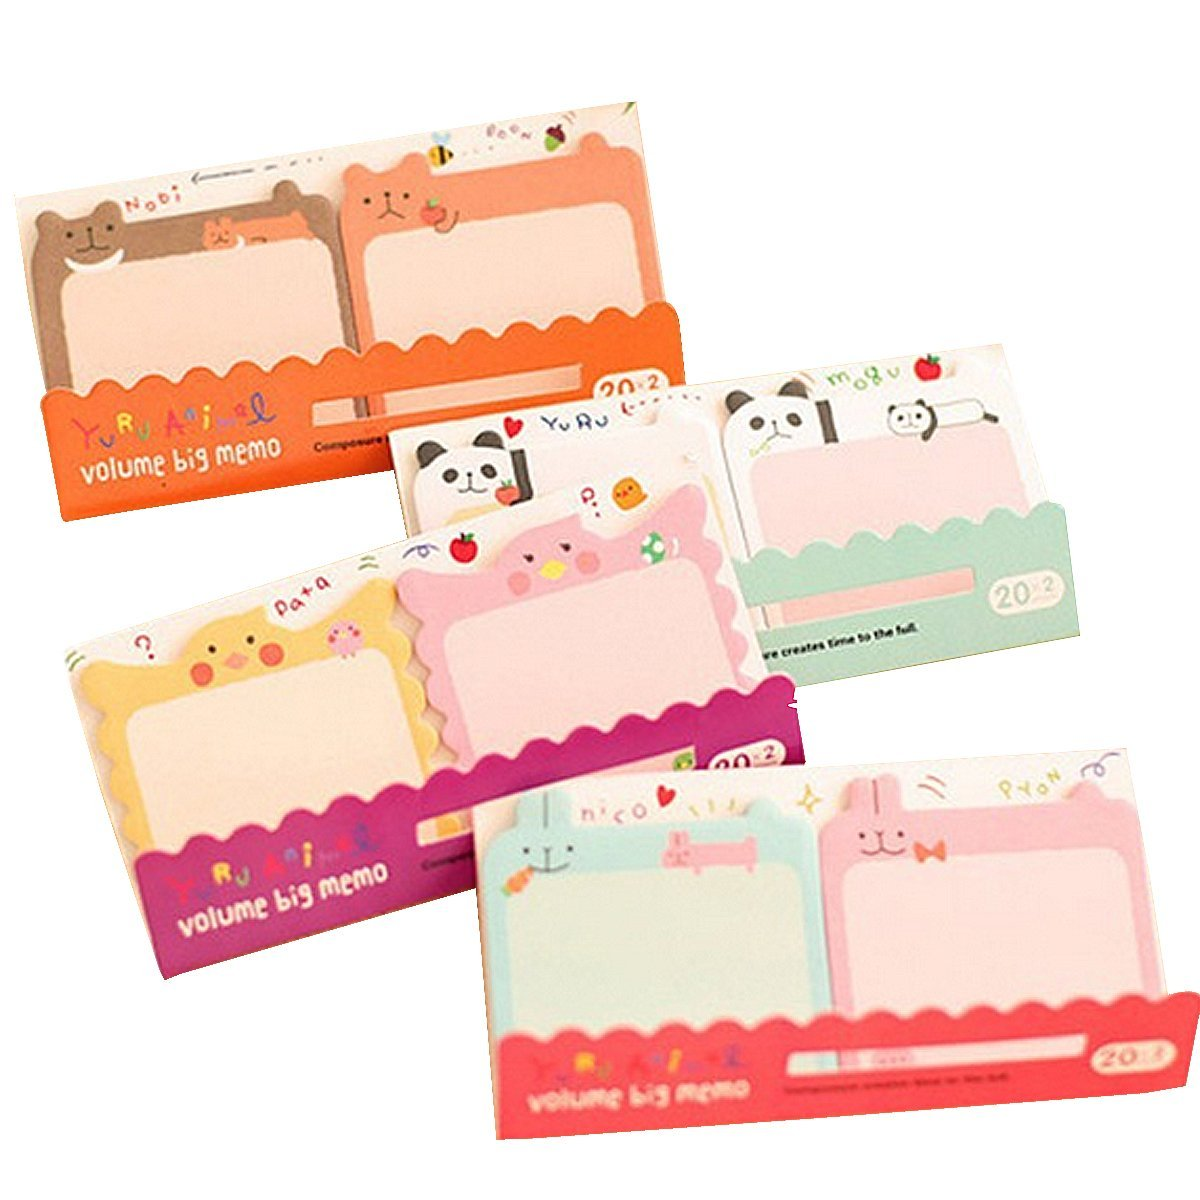 Mily Lovely Cute Fruit Shape Sticky Note Self-stick Note Pack of 10